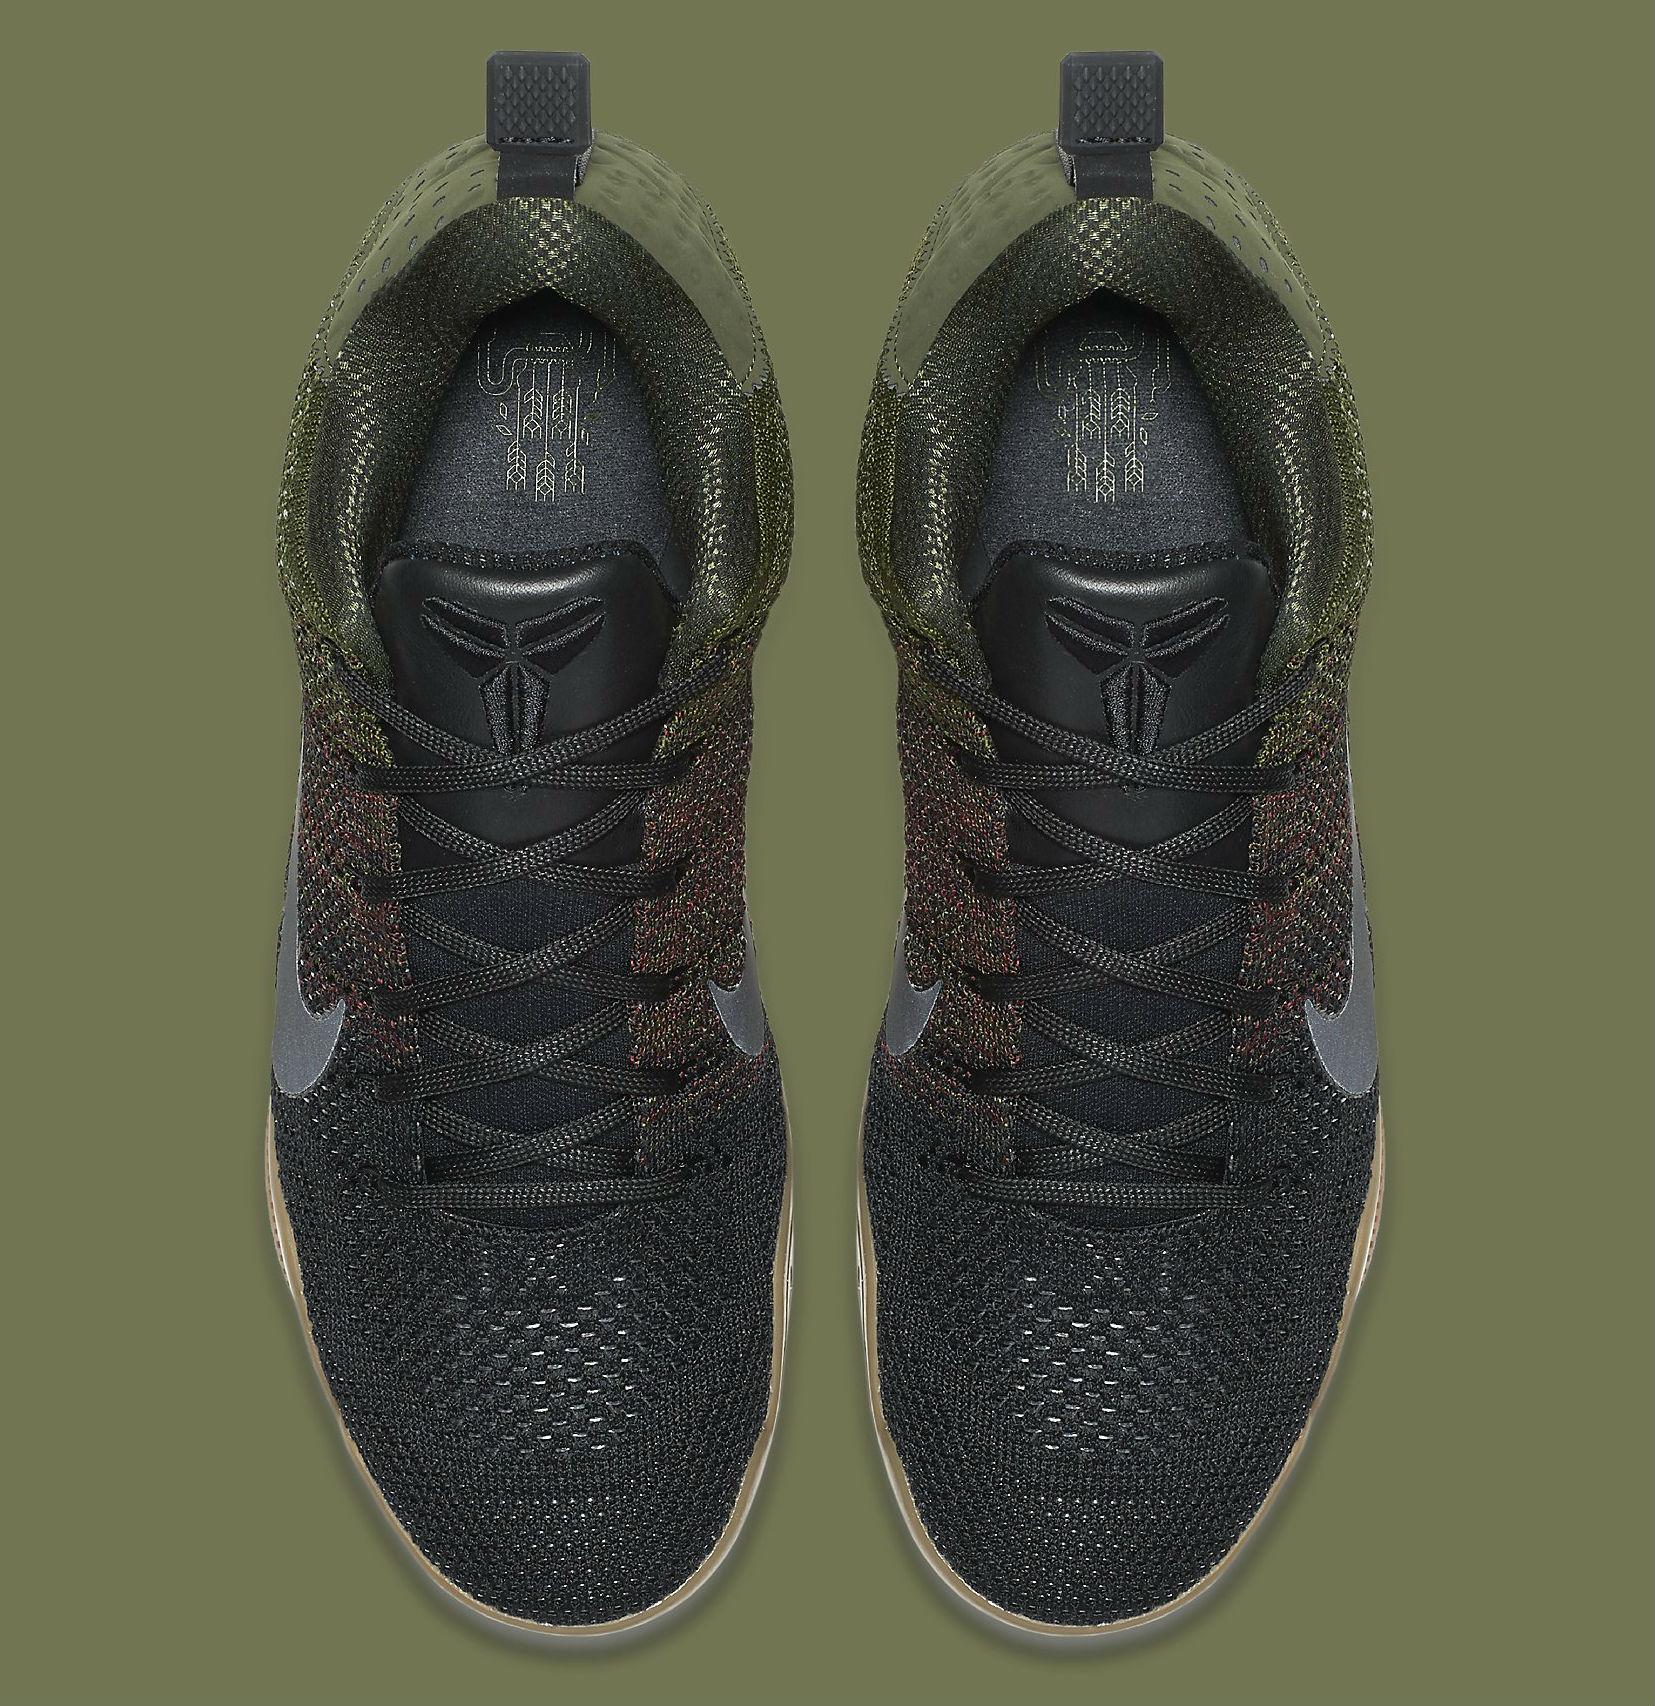 Nike Kobe 11 Elite Low Black Horse Top 824463-063 6917755885a4